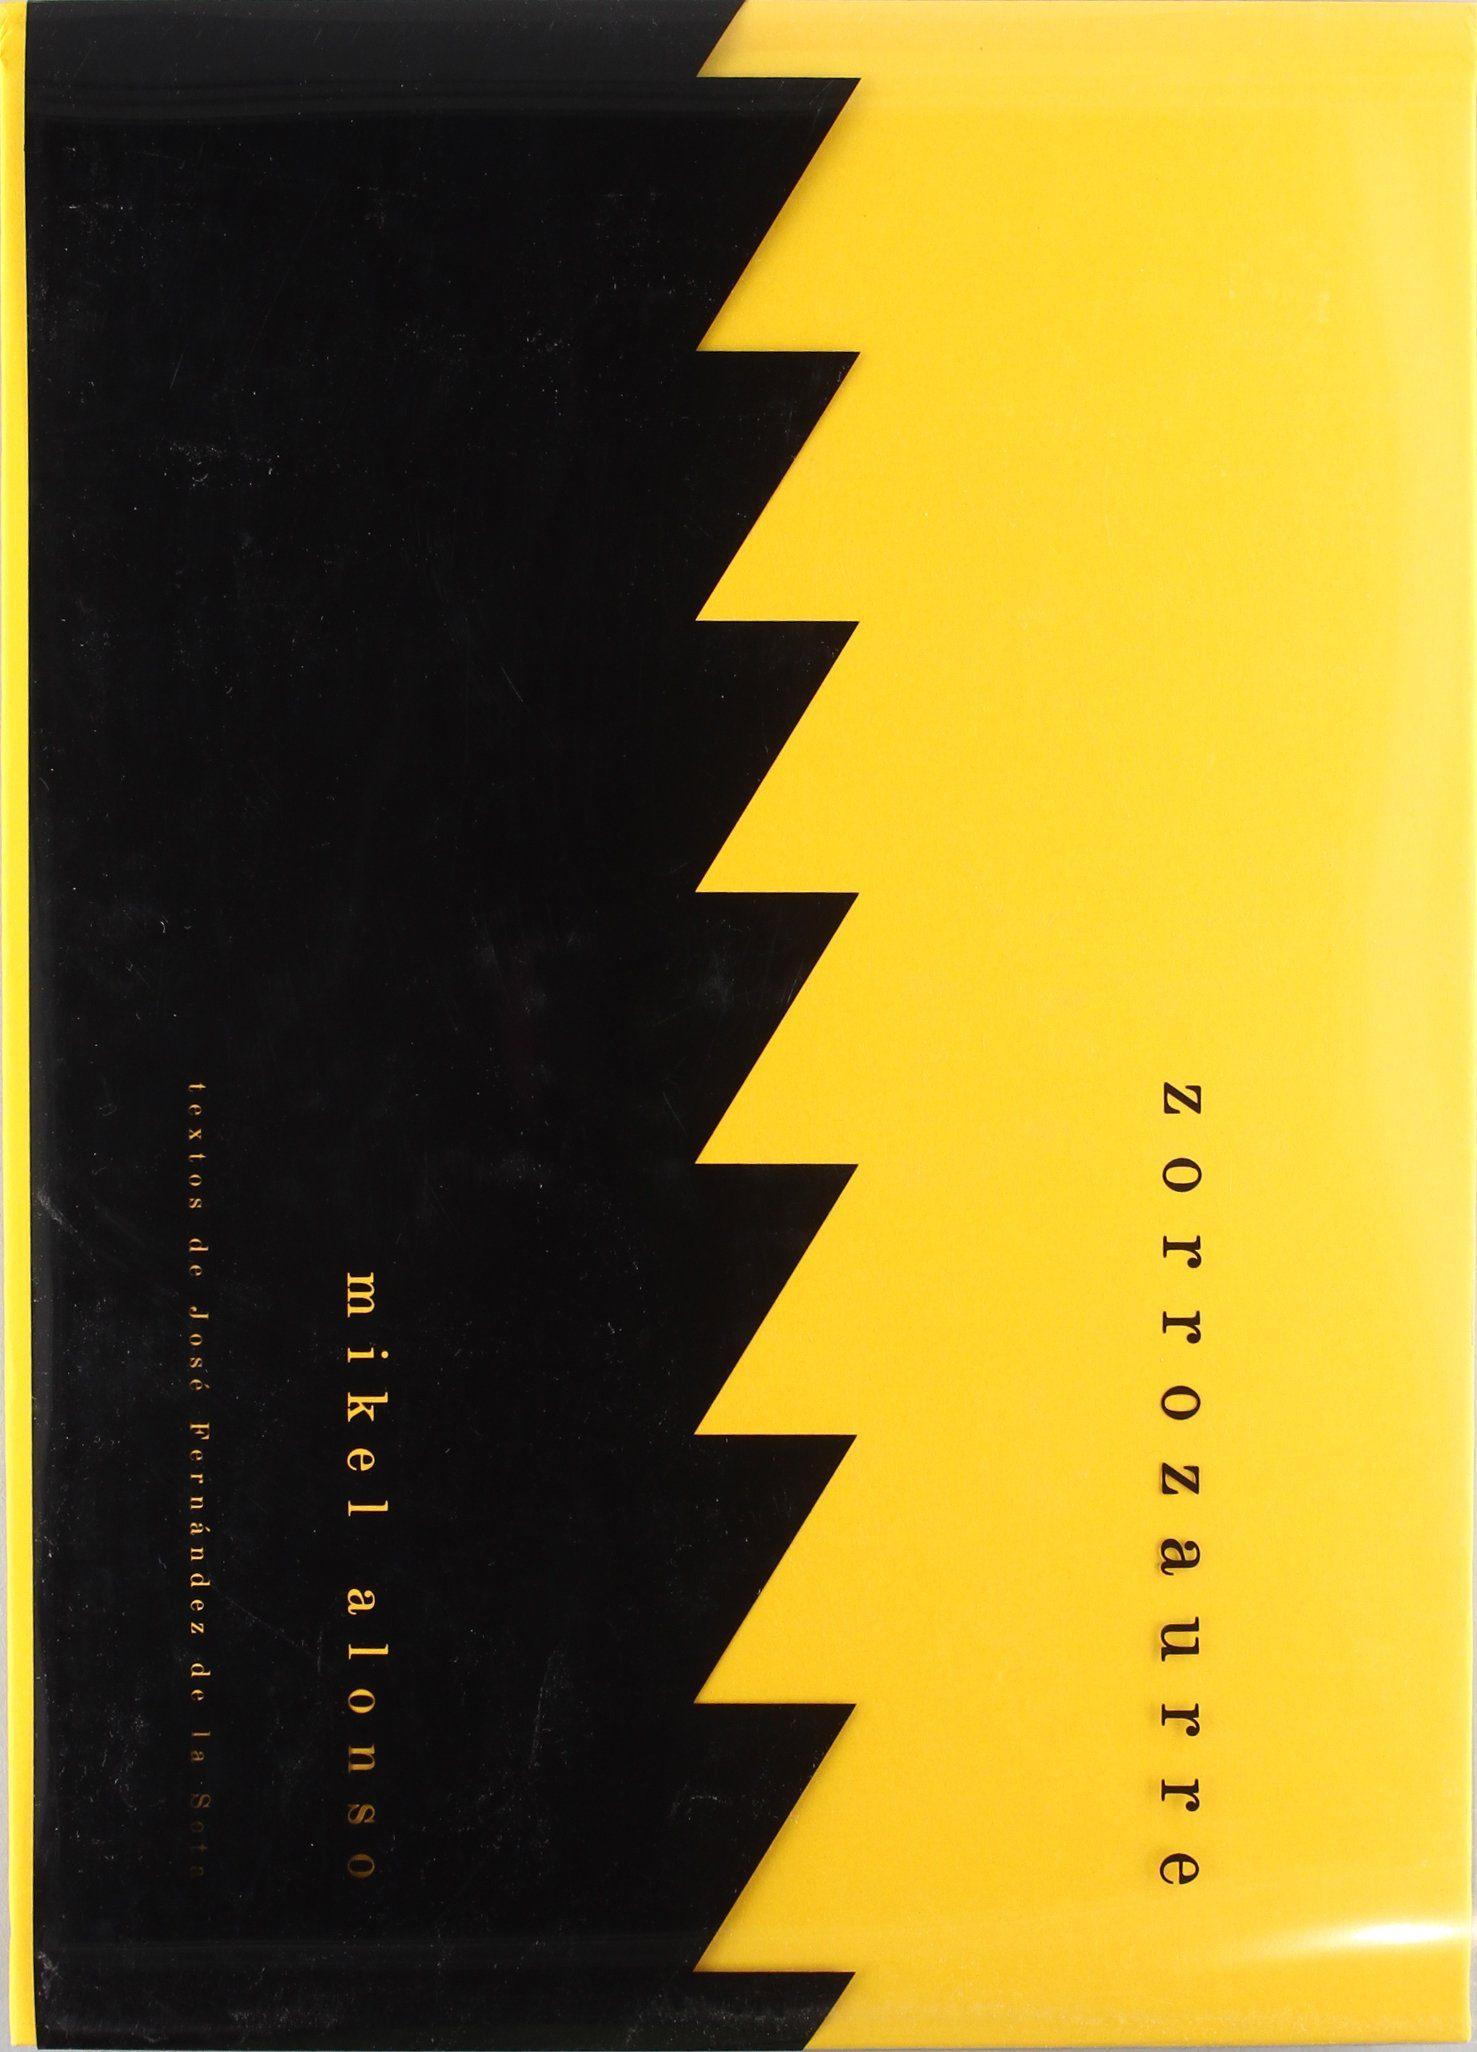 Zorrozaurre por Mikel Alonso